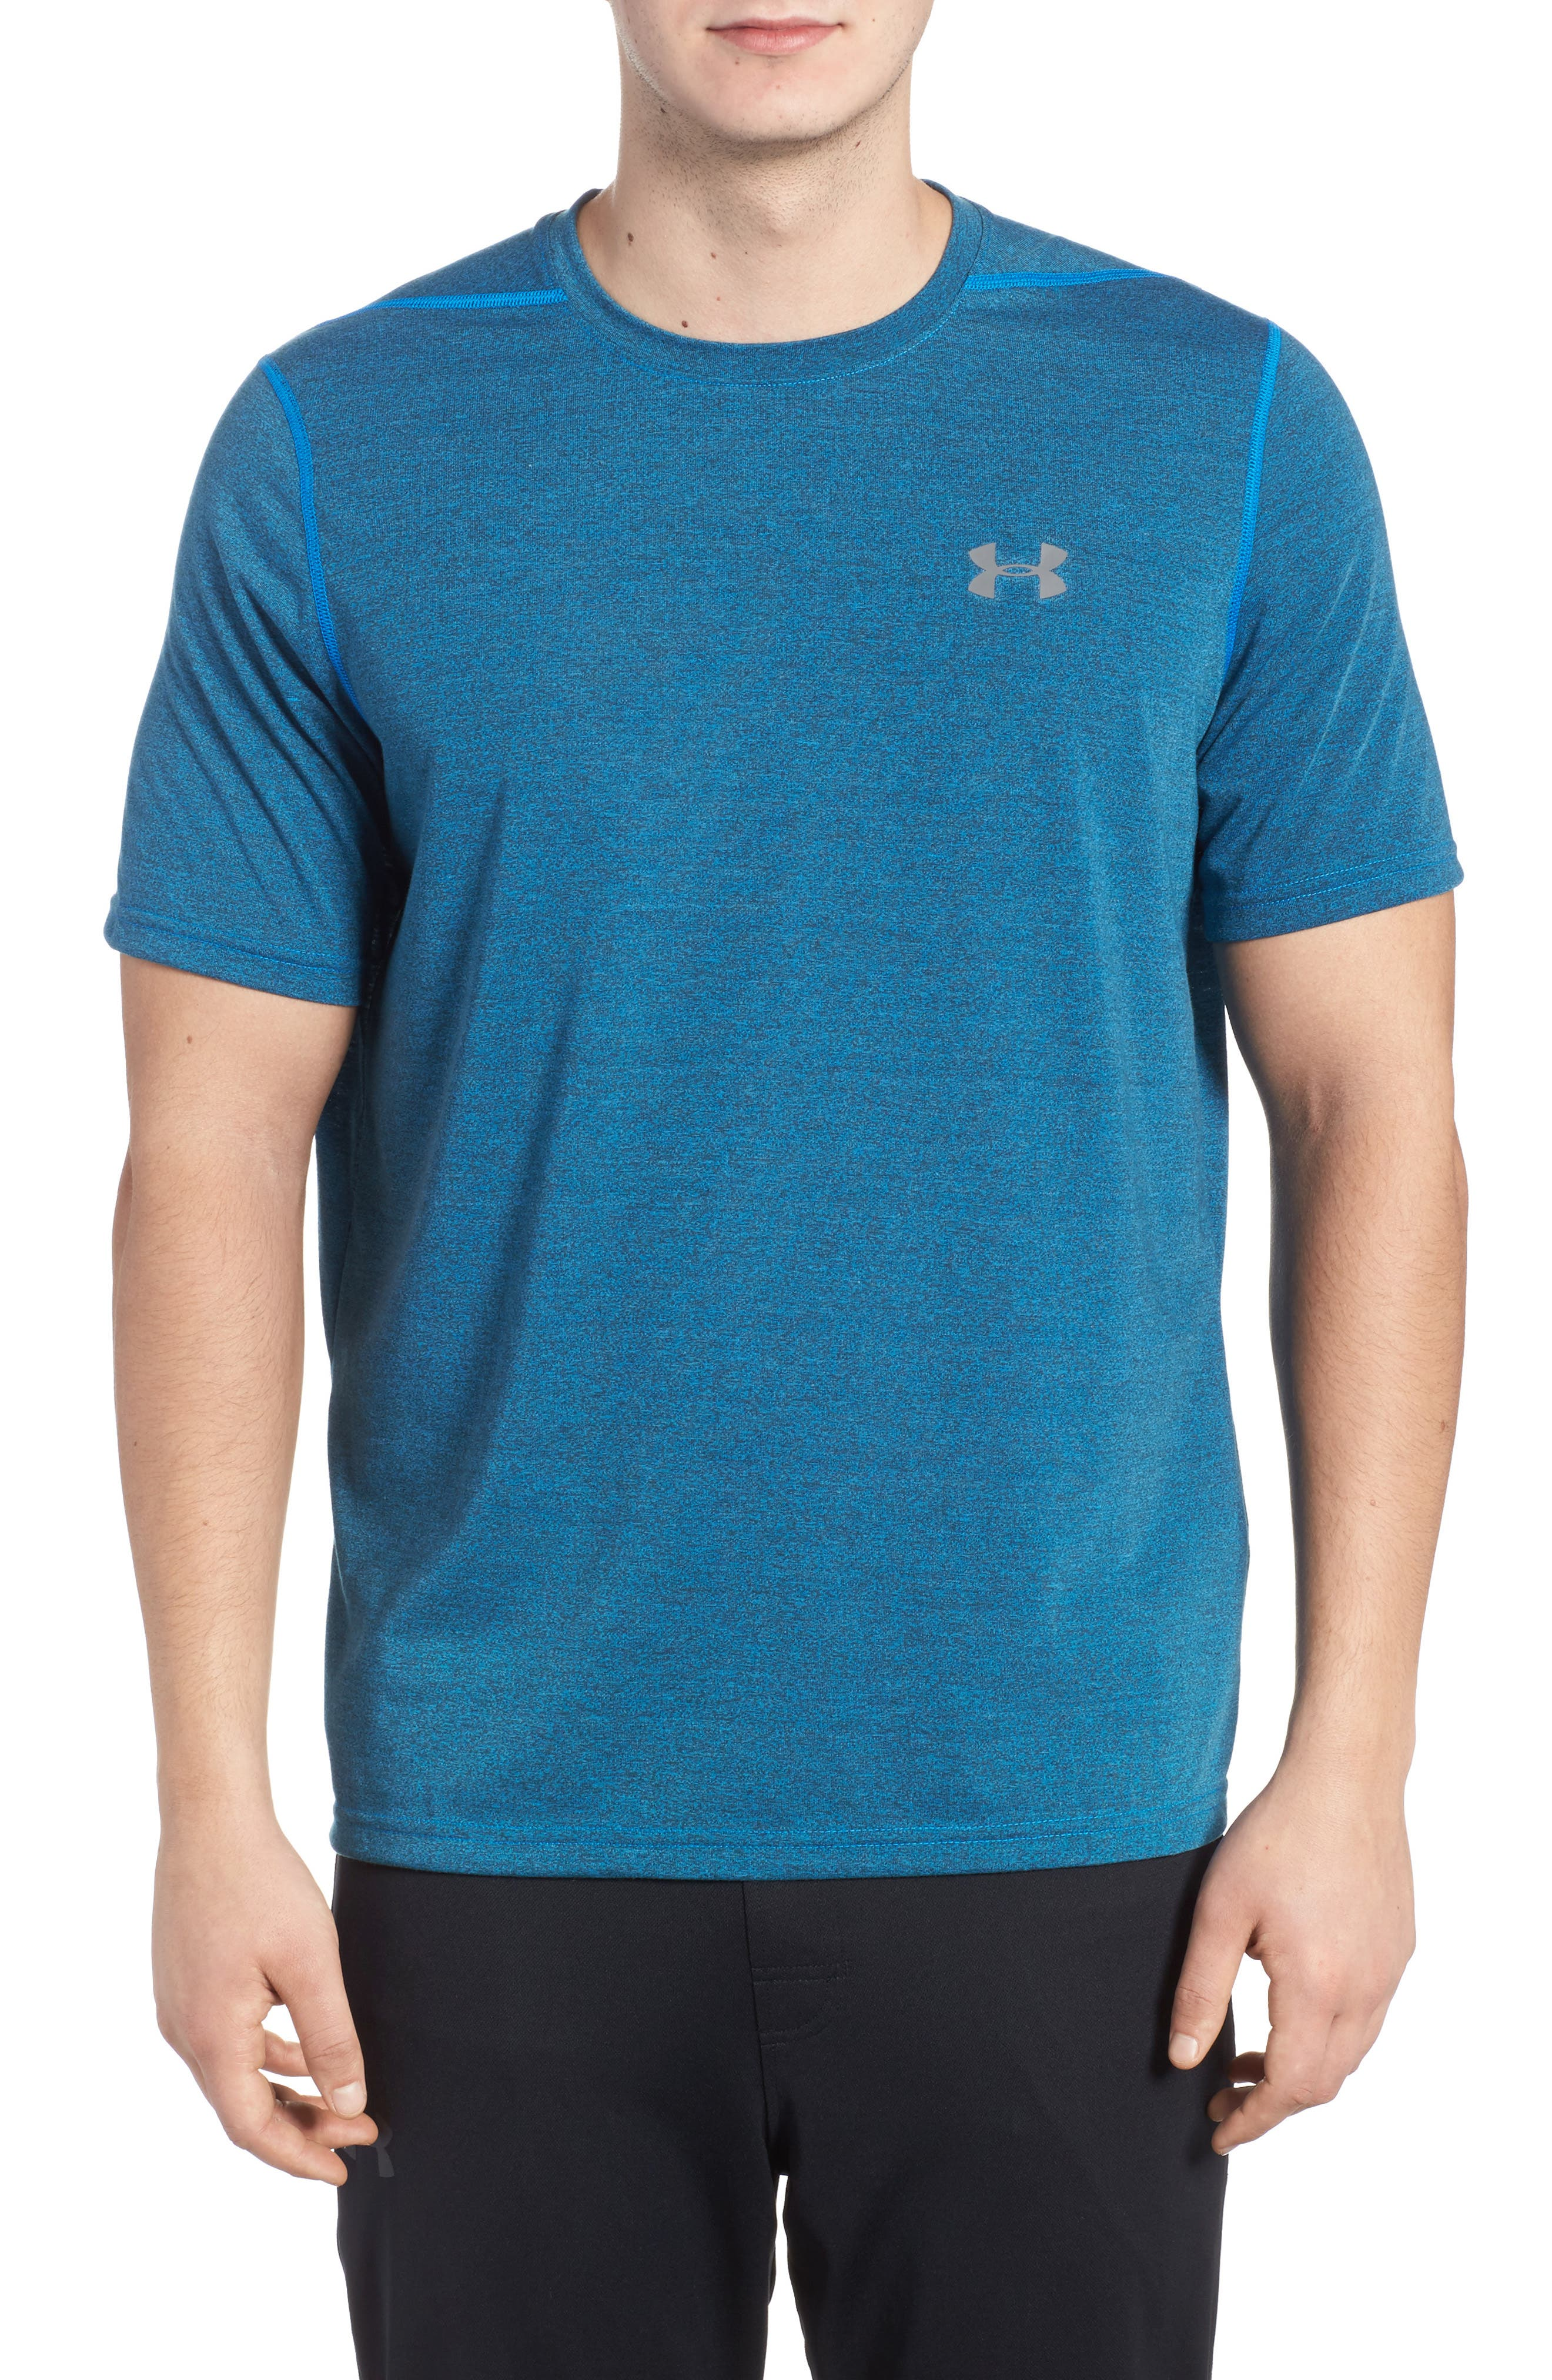 Under Armour Threadborne Siro 3C Twist T-Shirt